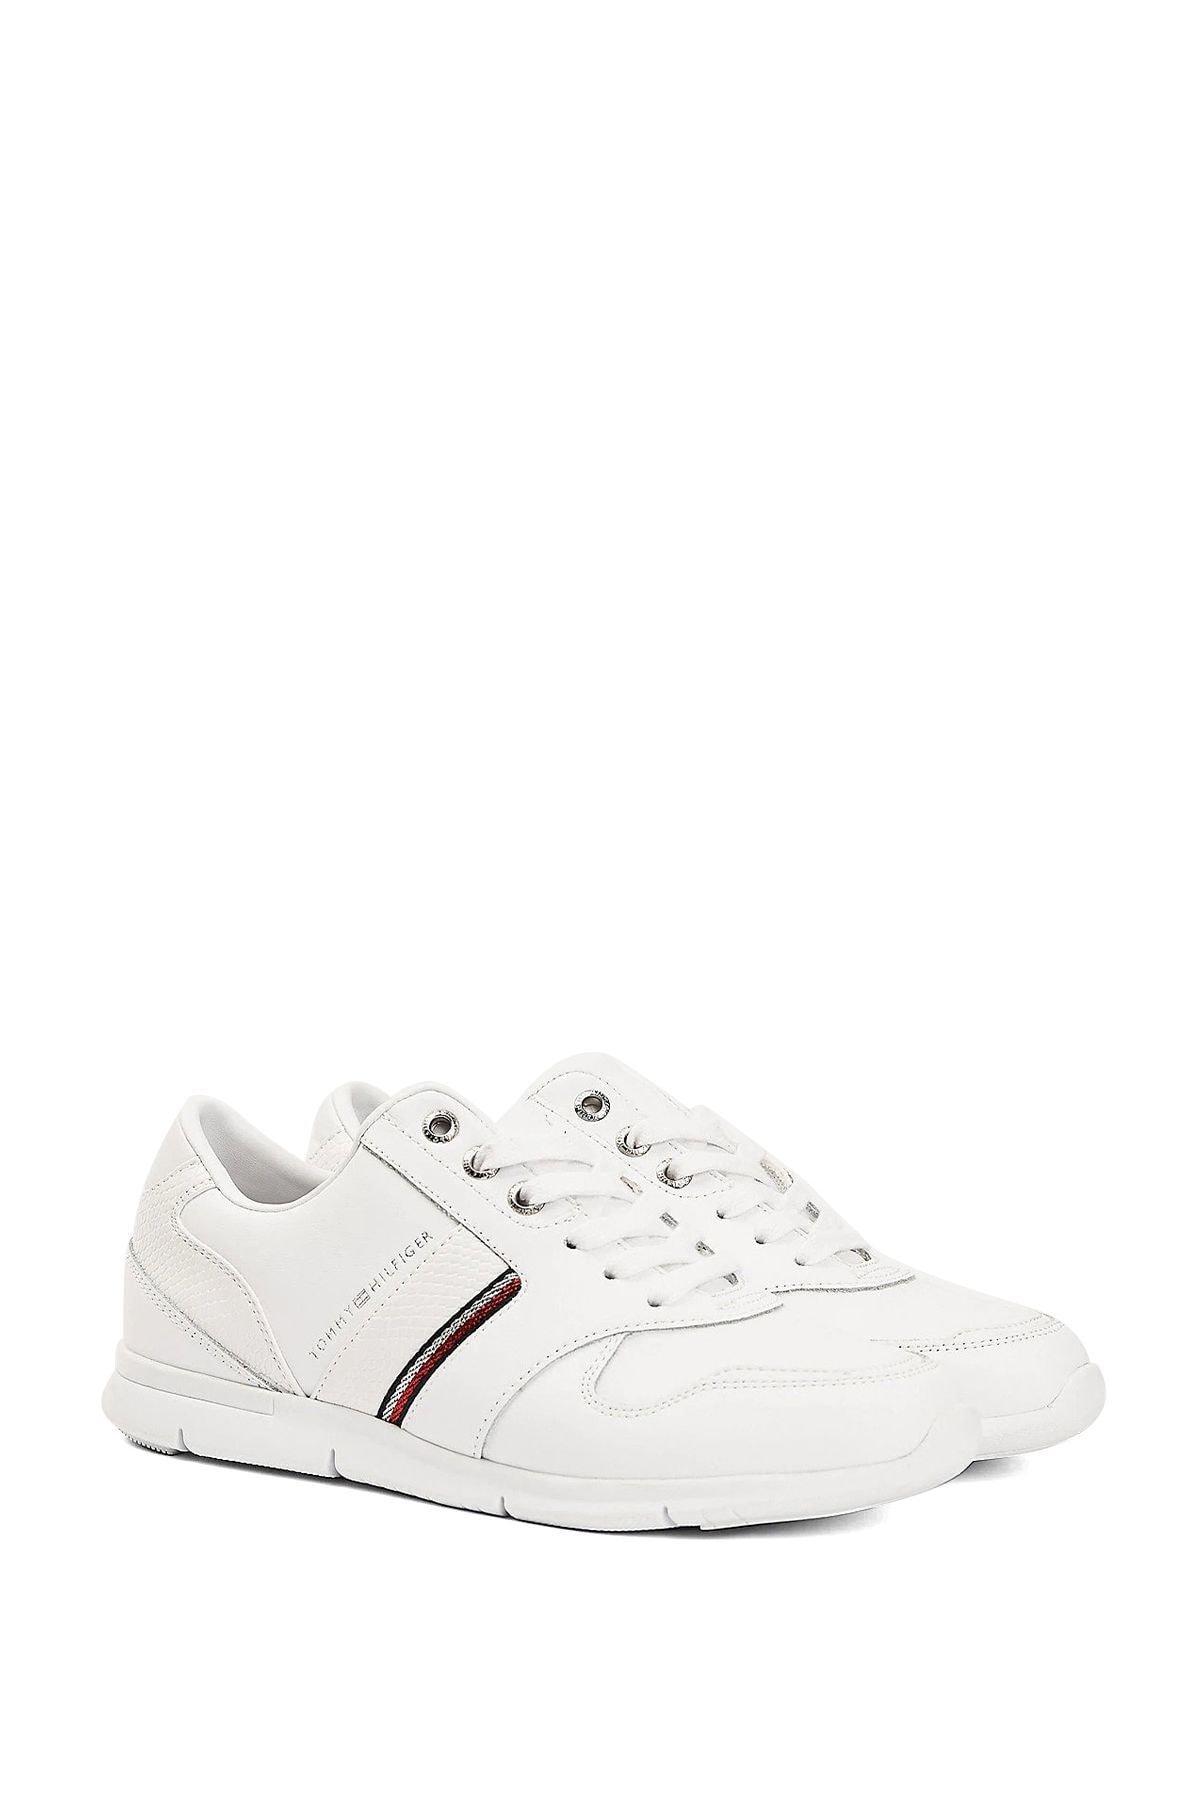 Tommy Hilfiger Kadın Beyaz Sneaker 1